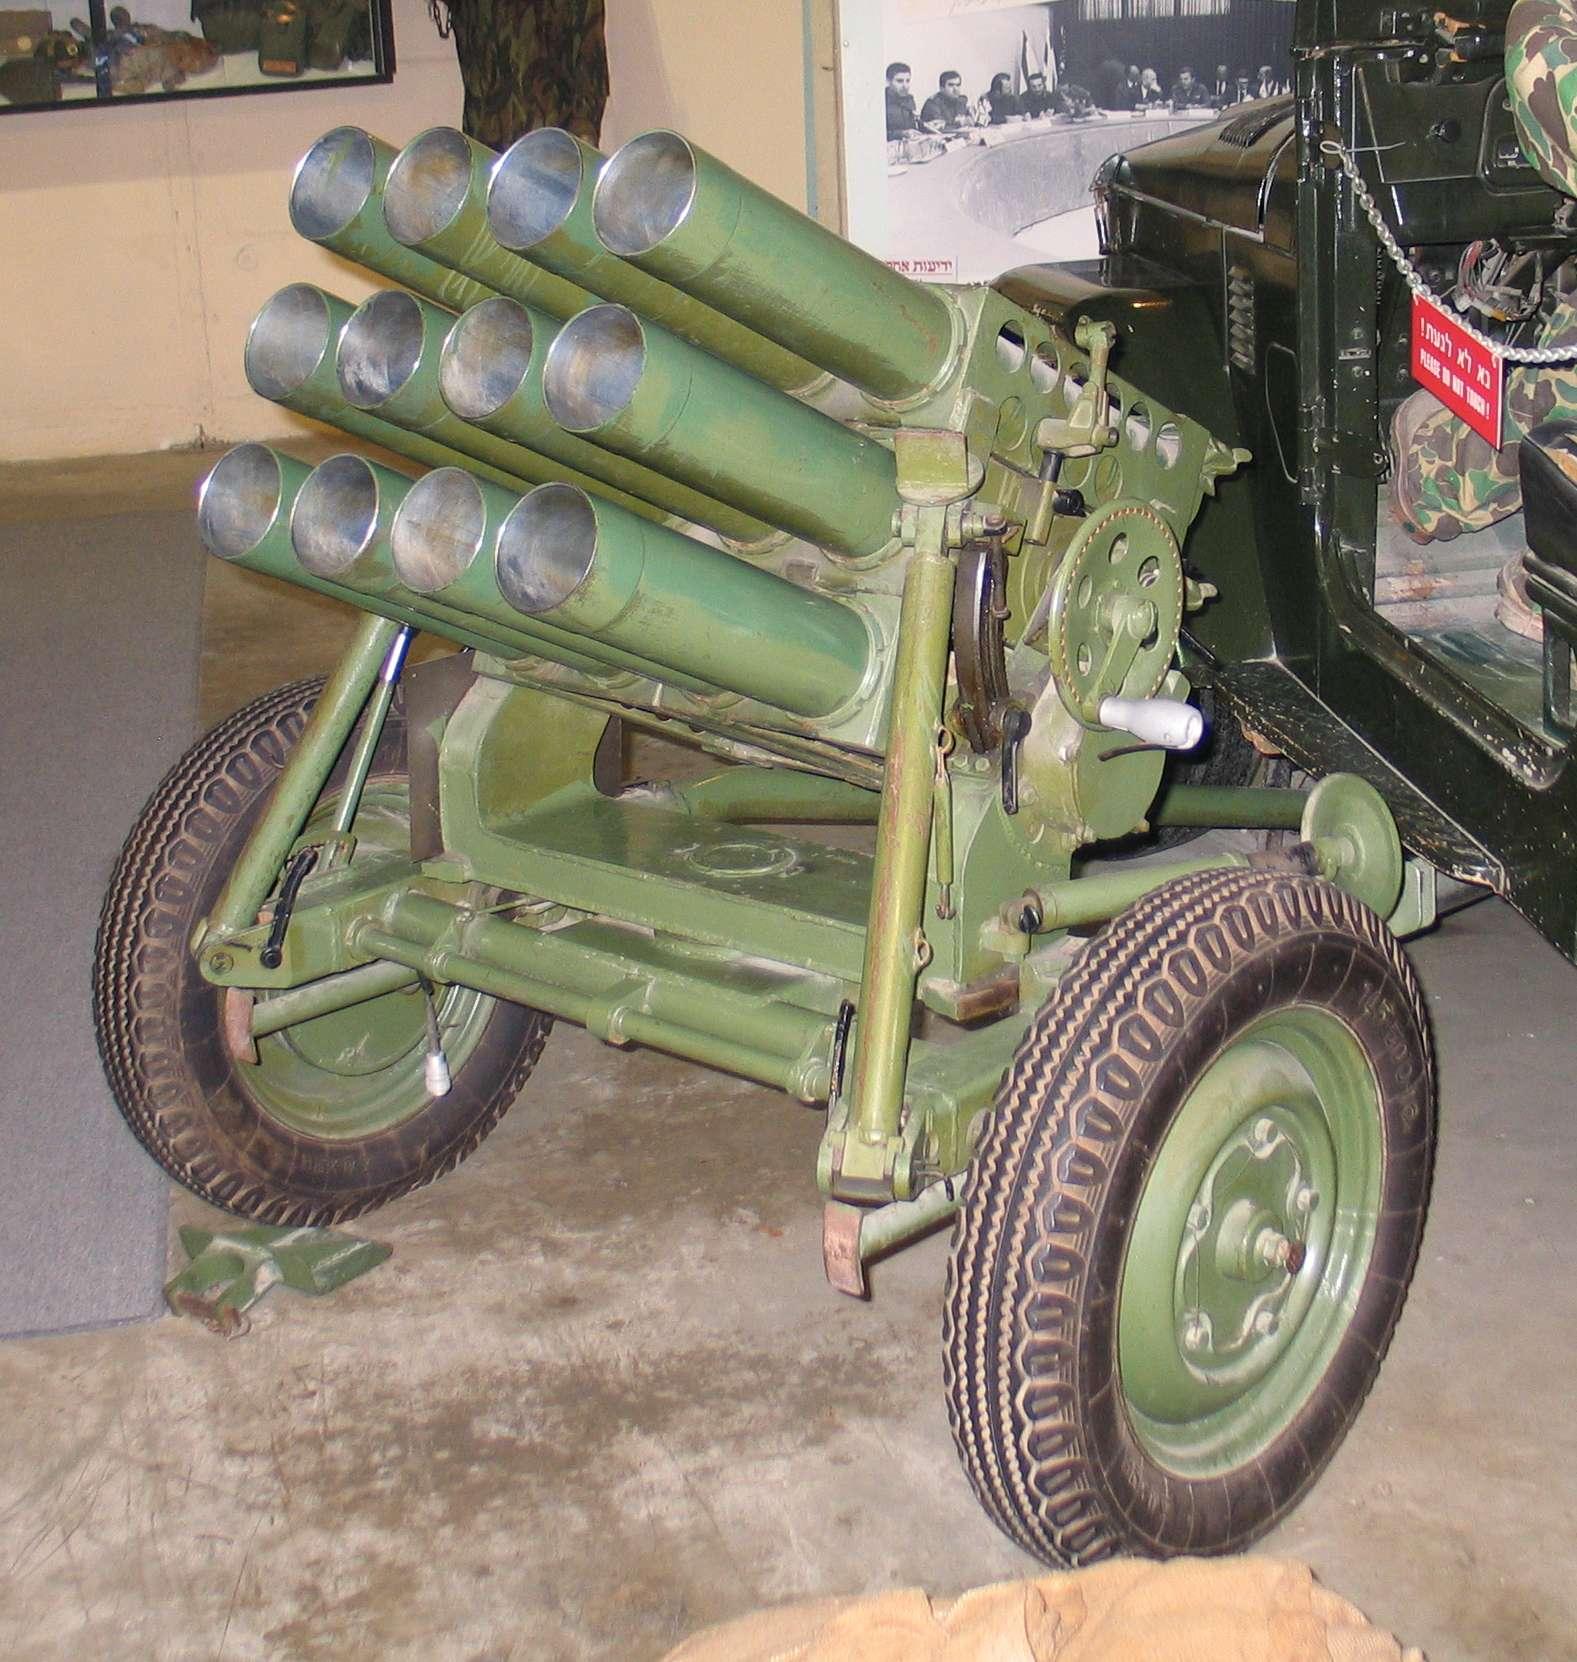 http://upload.wikimedia.org/wikipedia/commons/a/a6/107mm-type-63-batey-haosef-1.jpg